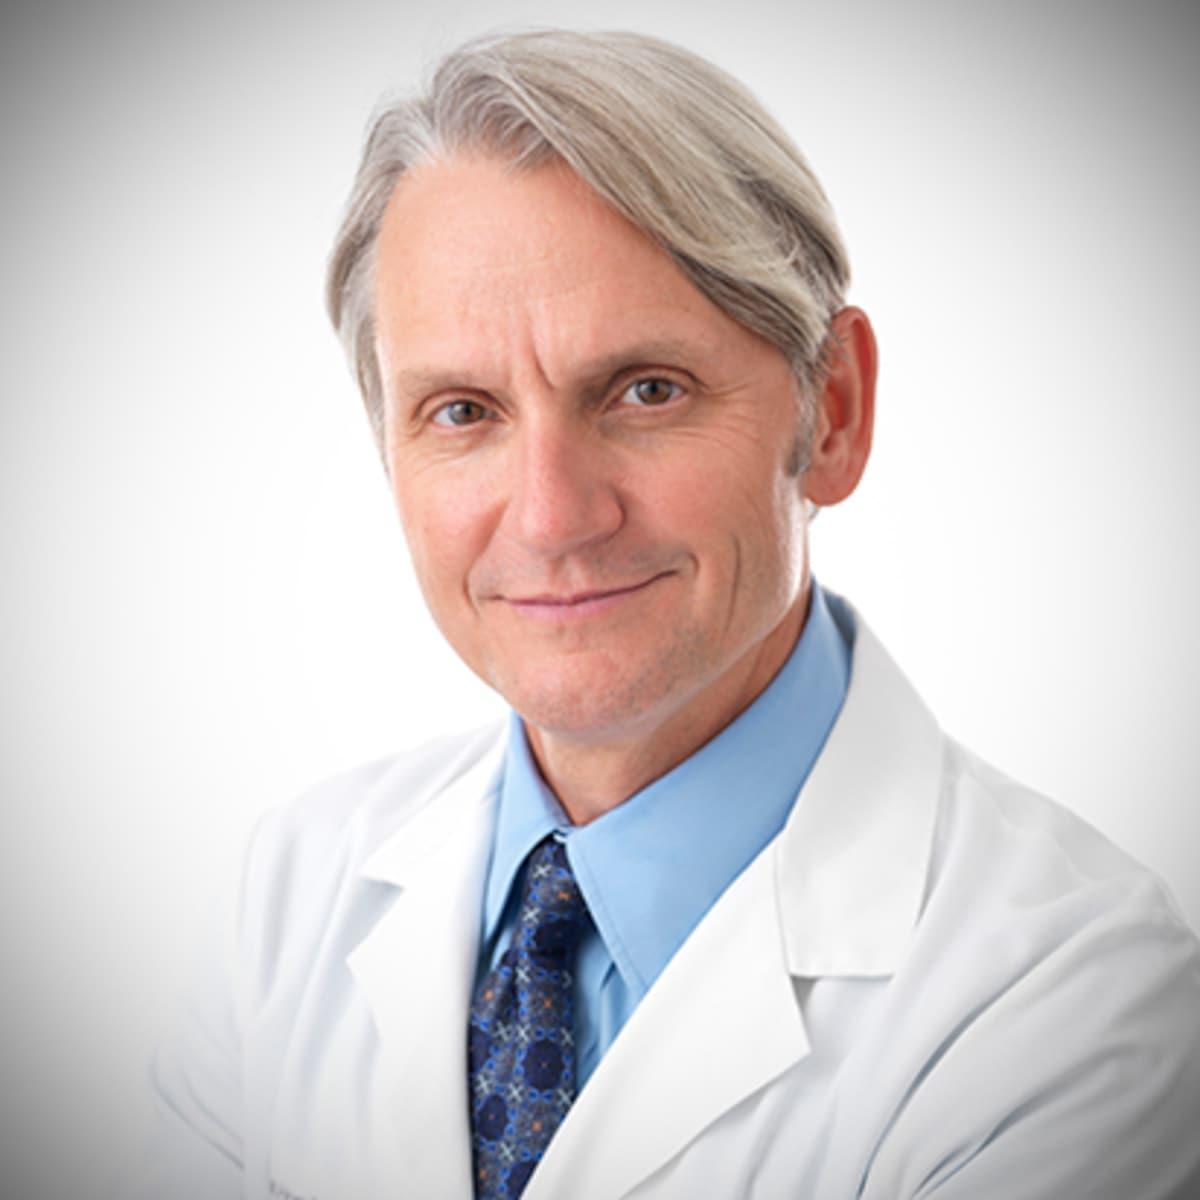 Doctor Reviews Cincinnati Video | Dr. Mich...